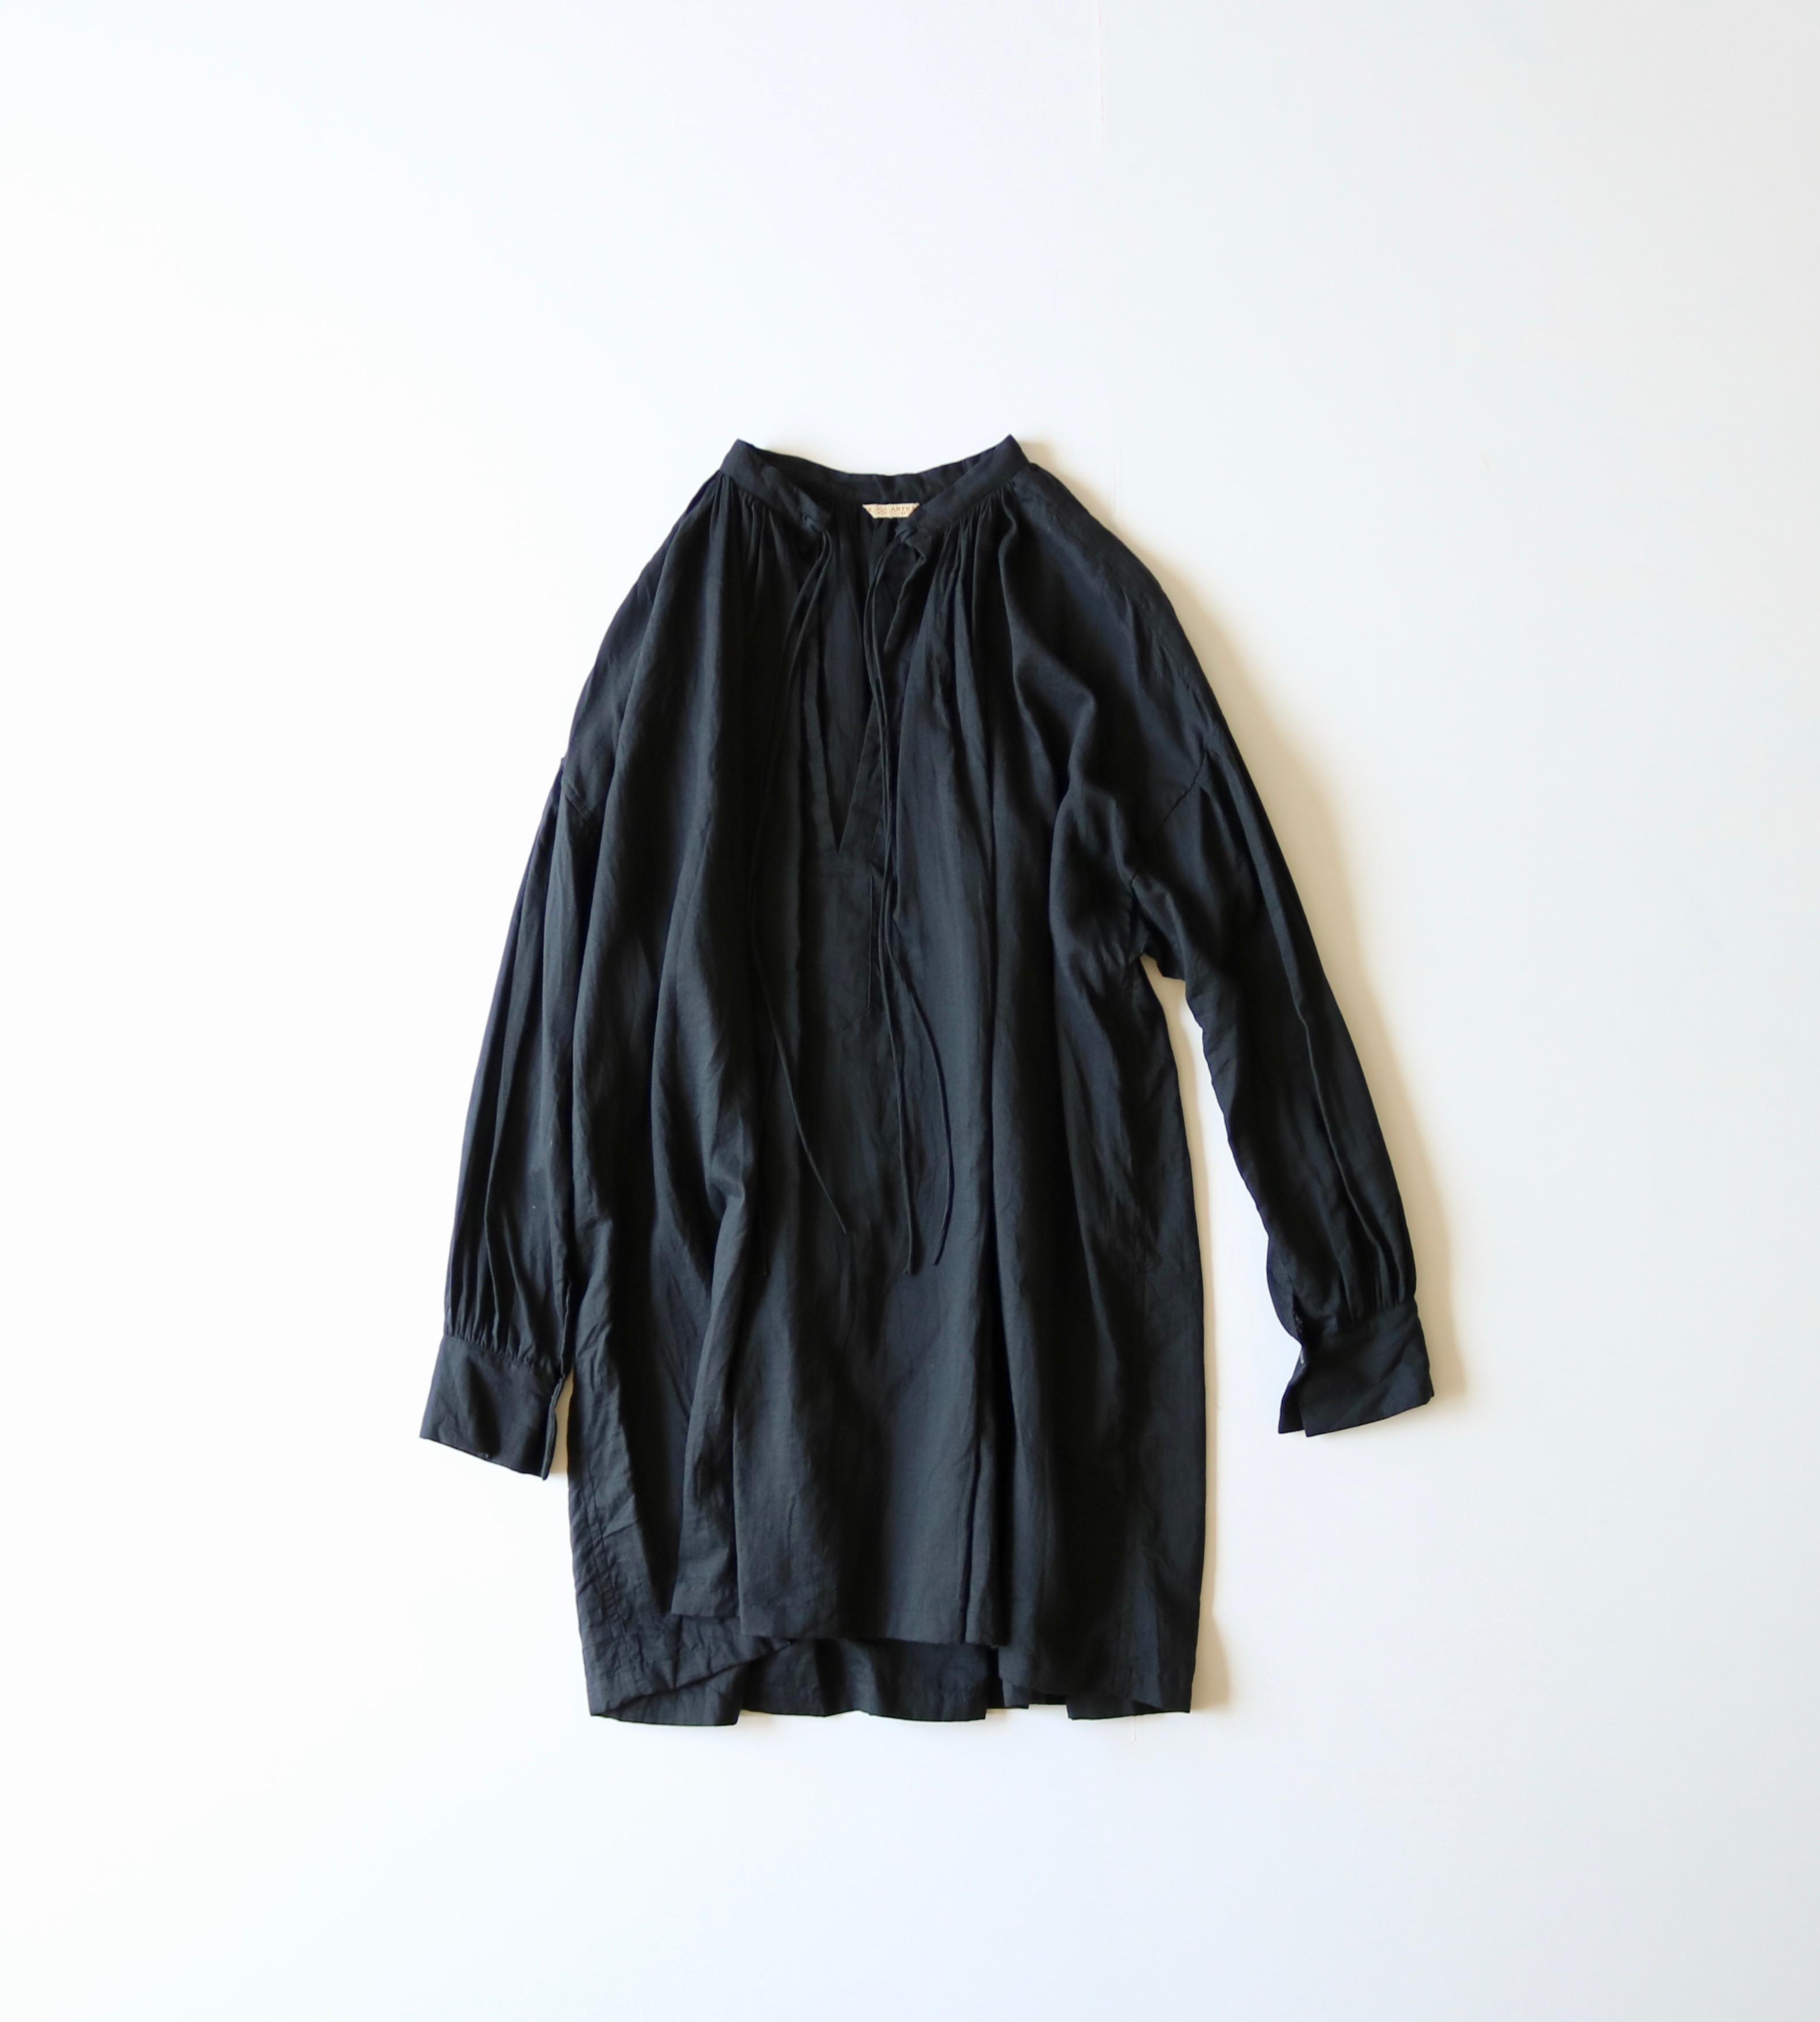 ARTS&SCIENCE   String gather blouse 通販 ブラウス アーツ&サイエンス